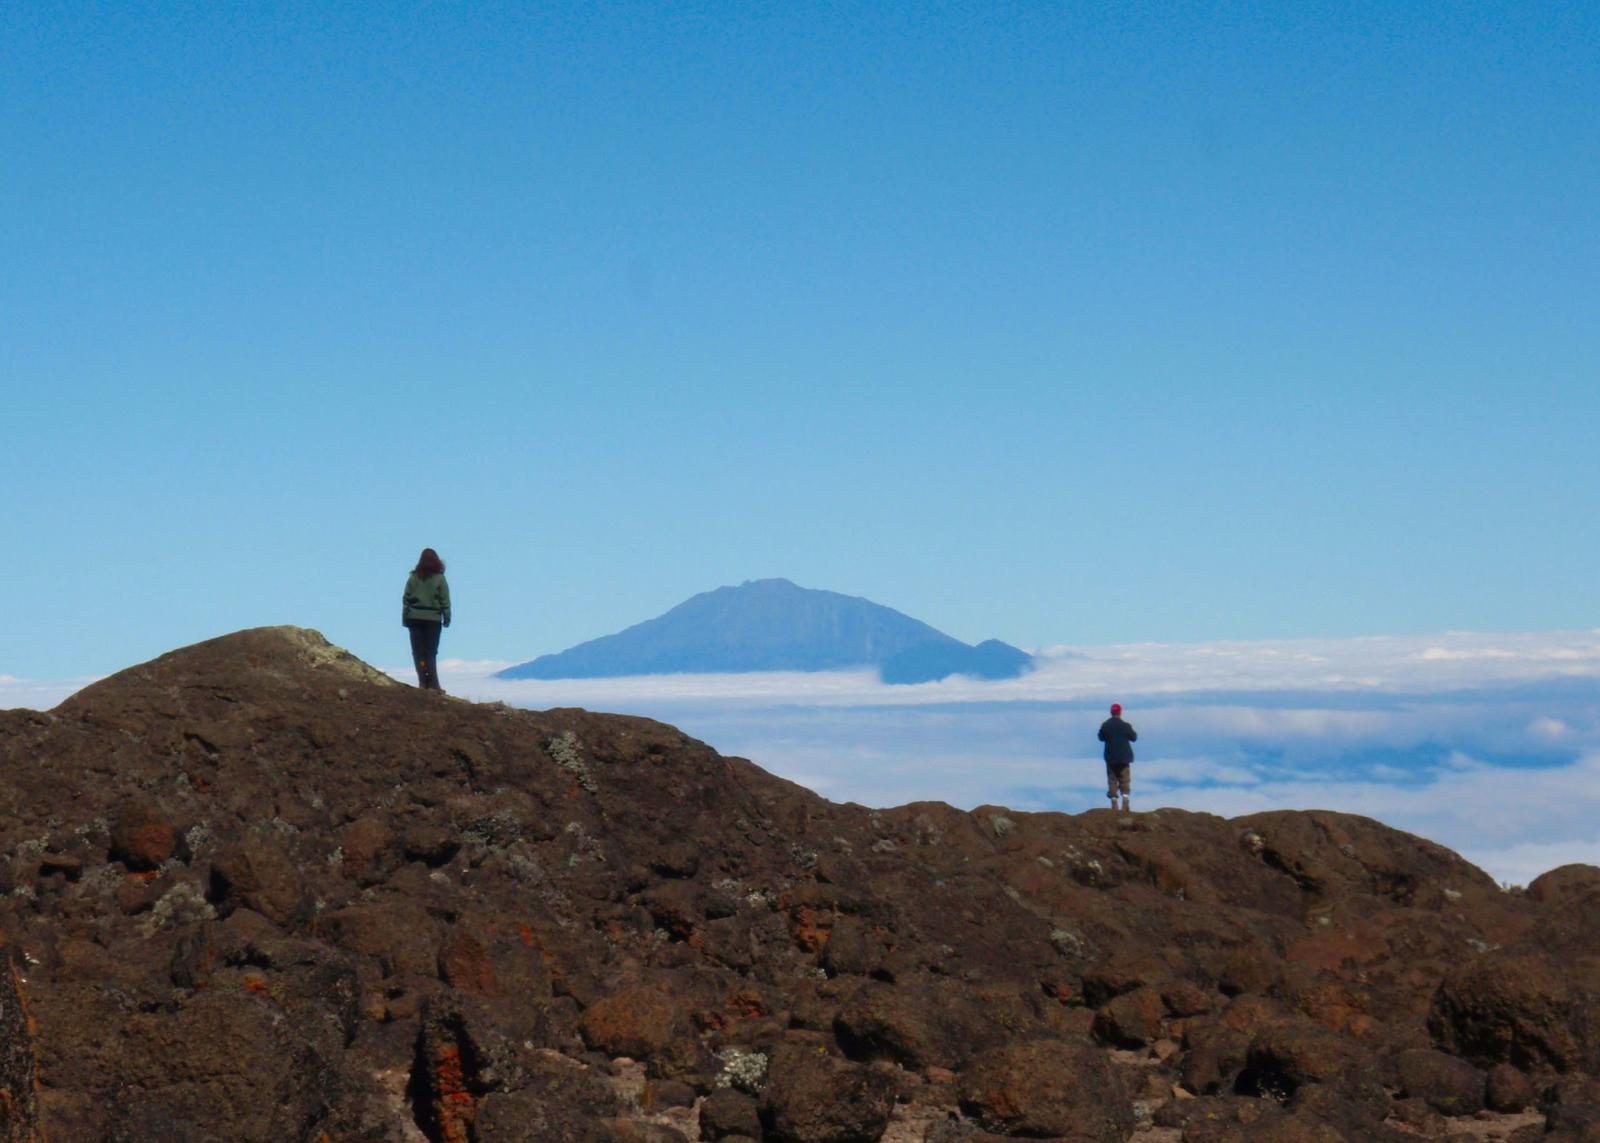 tsk-kilimanjaro-routes-spiral-itinerary